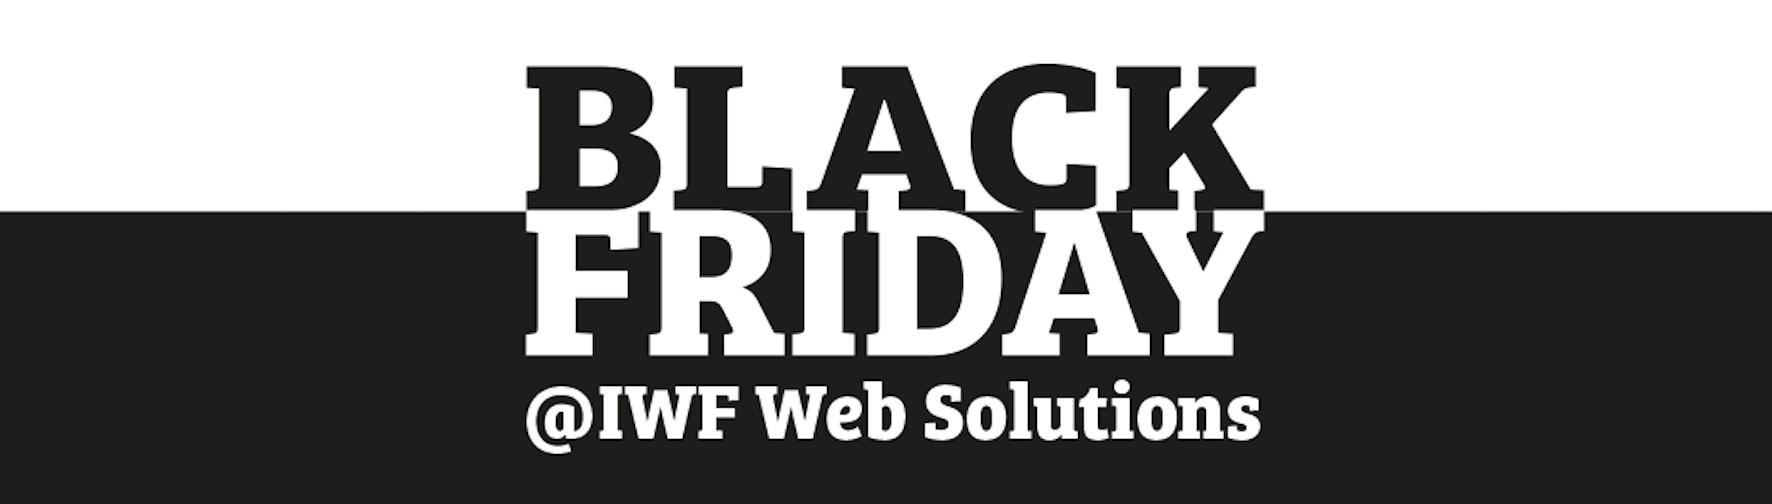 unsere angebote zum black friday iwf. Black Bedroom Furniture Sets. Home Design Ideas